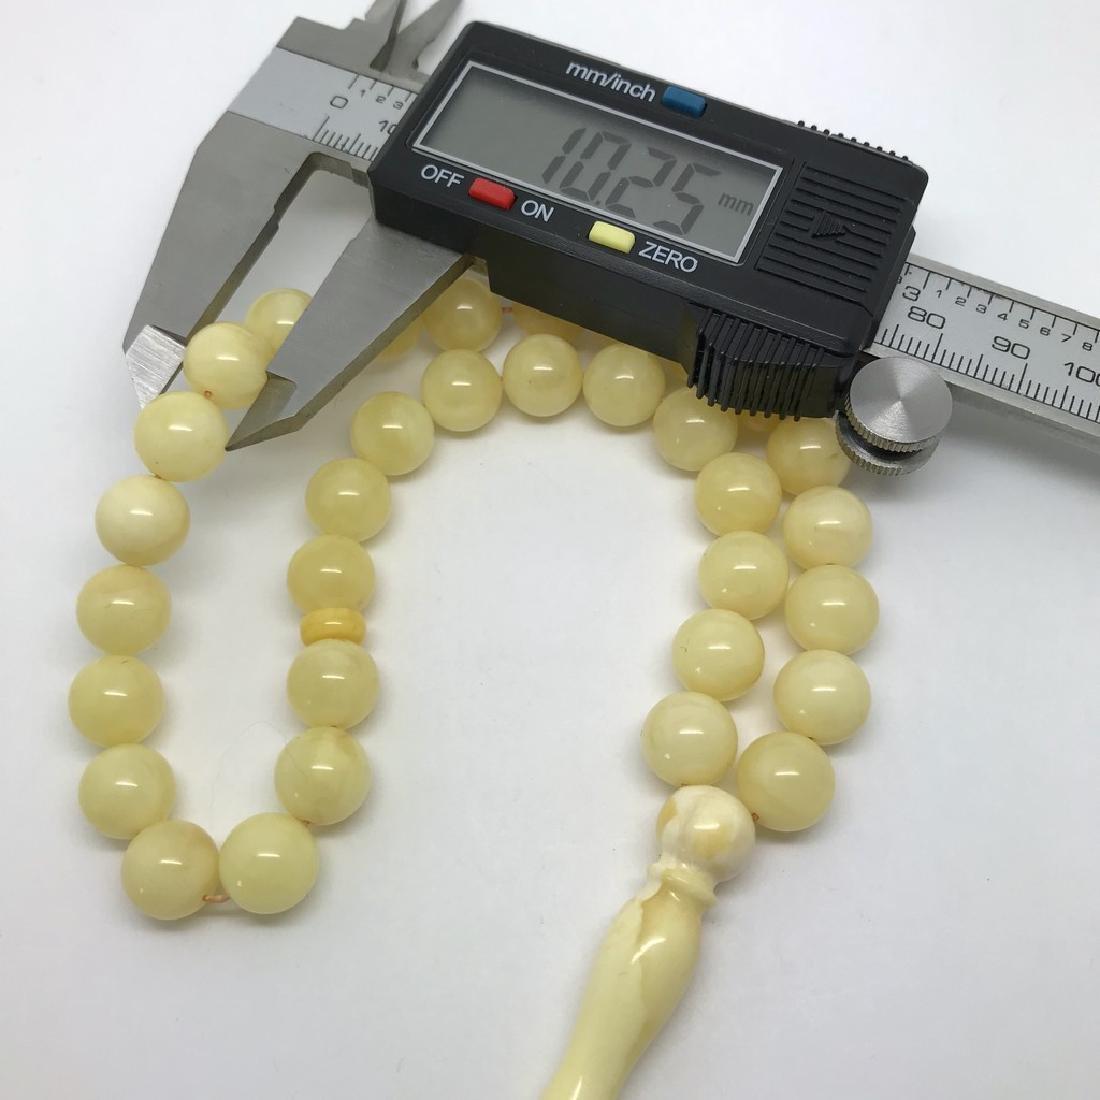 Misbaha tesbih Baltic amber white 33 beads ø10mm 22.7 - 5